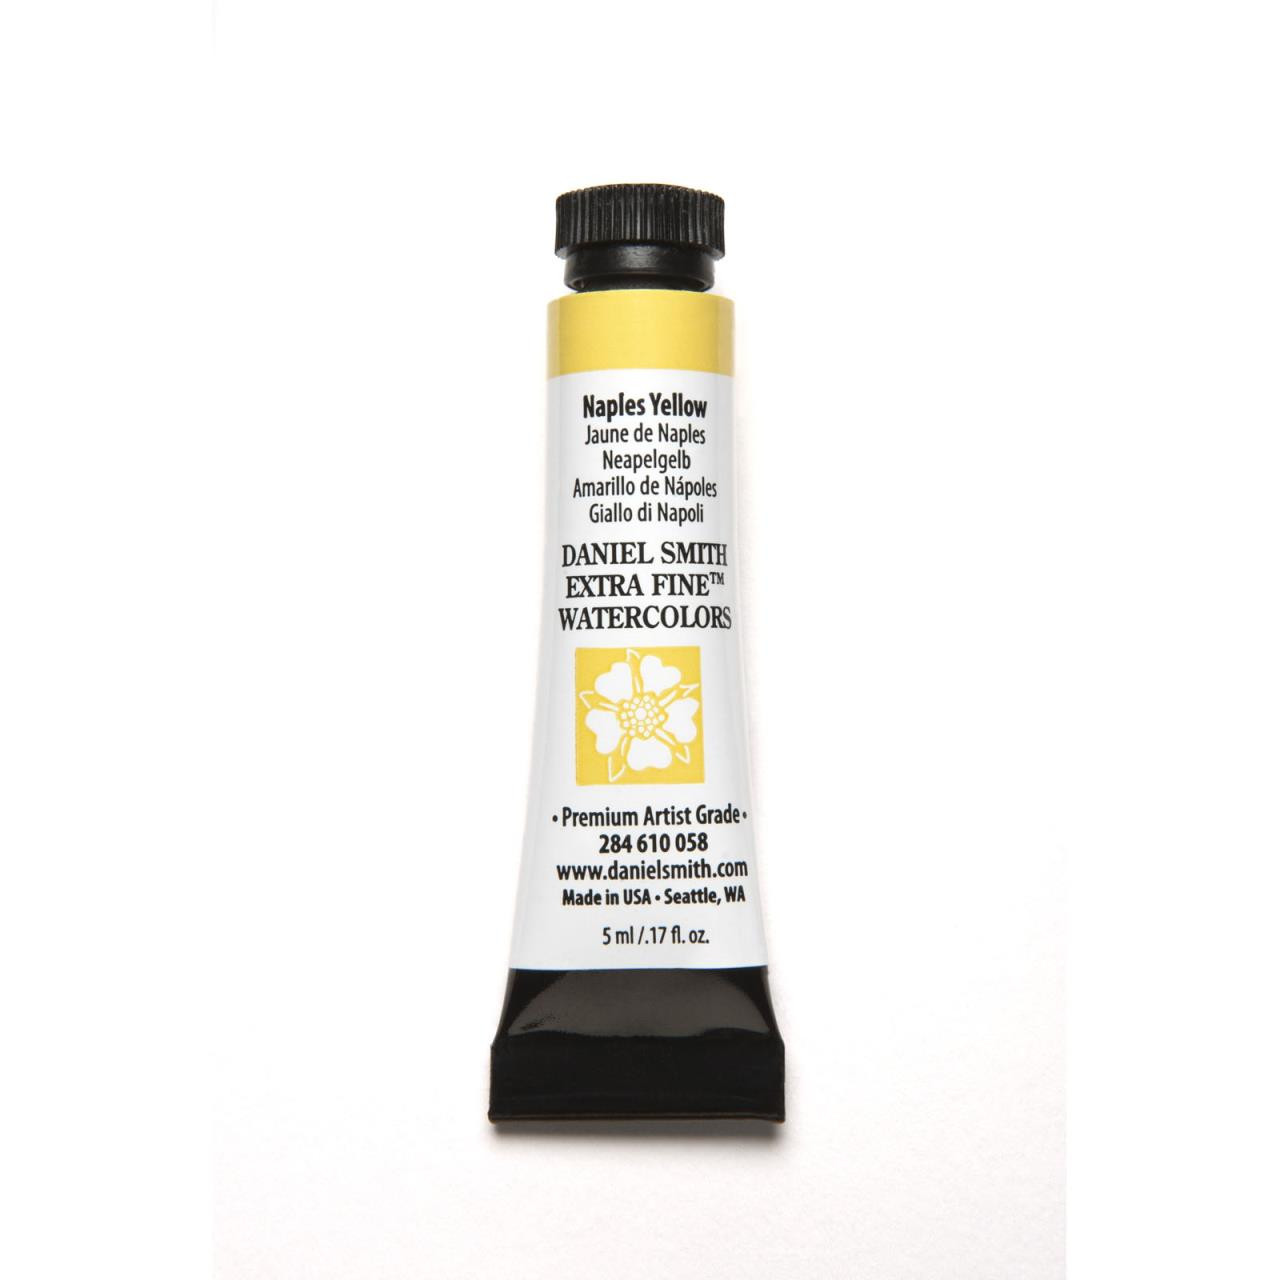 Naples Yellow, DANIEL SMITH Extra Fine Watercolors 5ml Tubes -